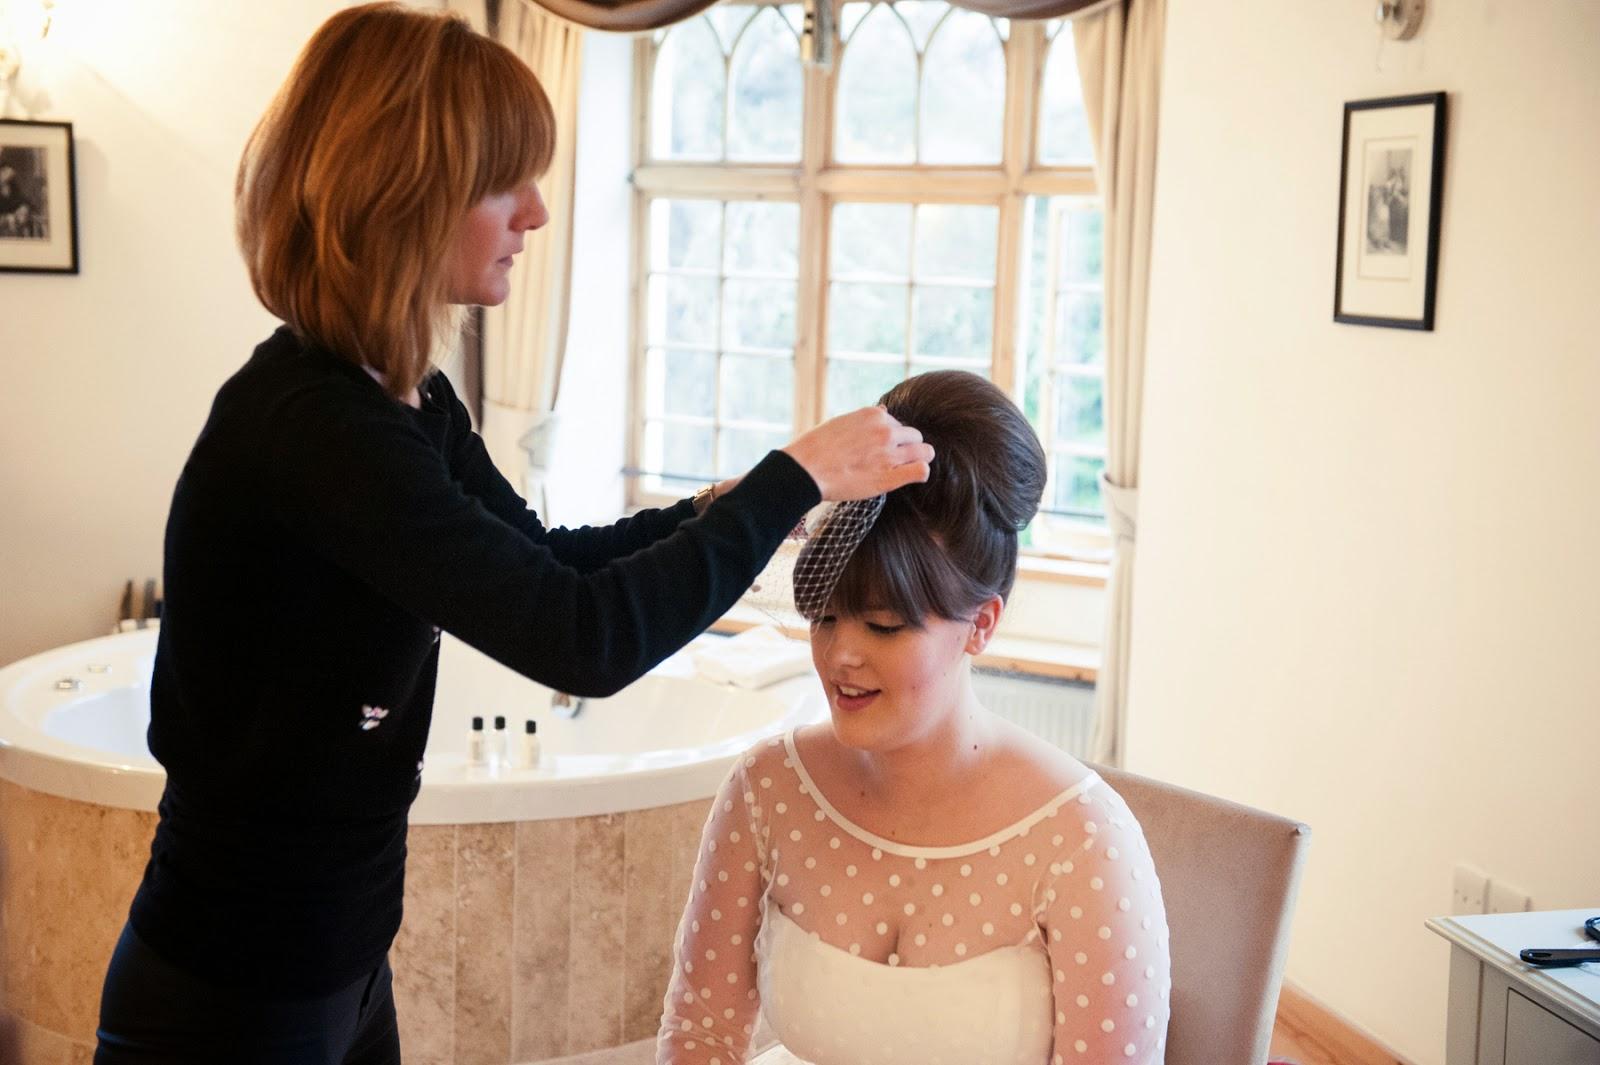 hairdresser fitting vintage style birdcage veil accessory.